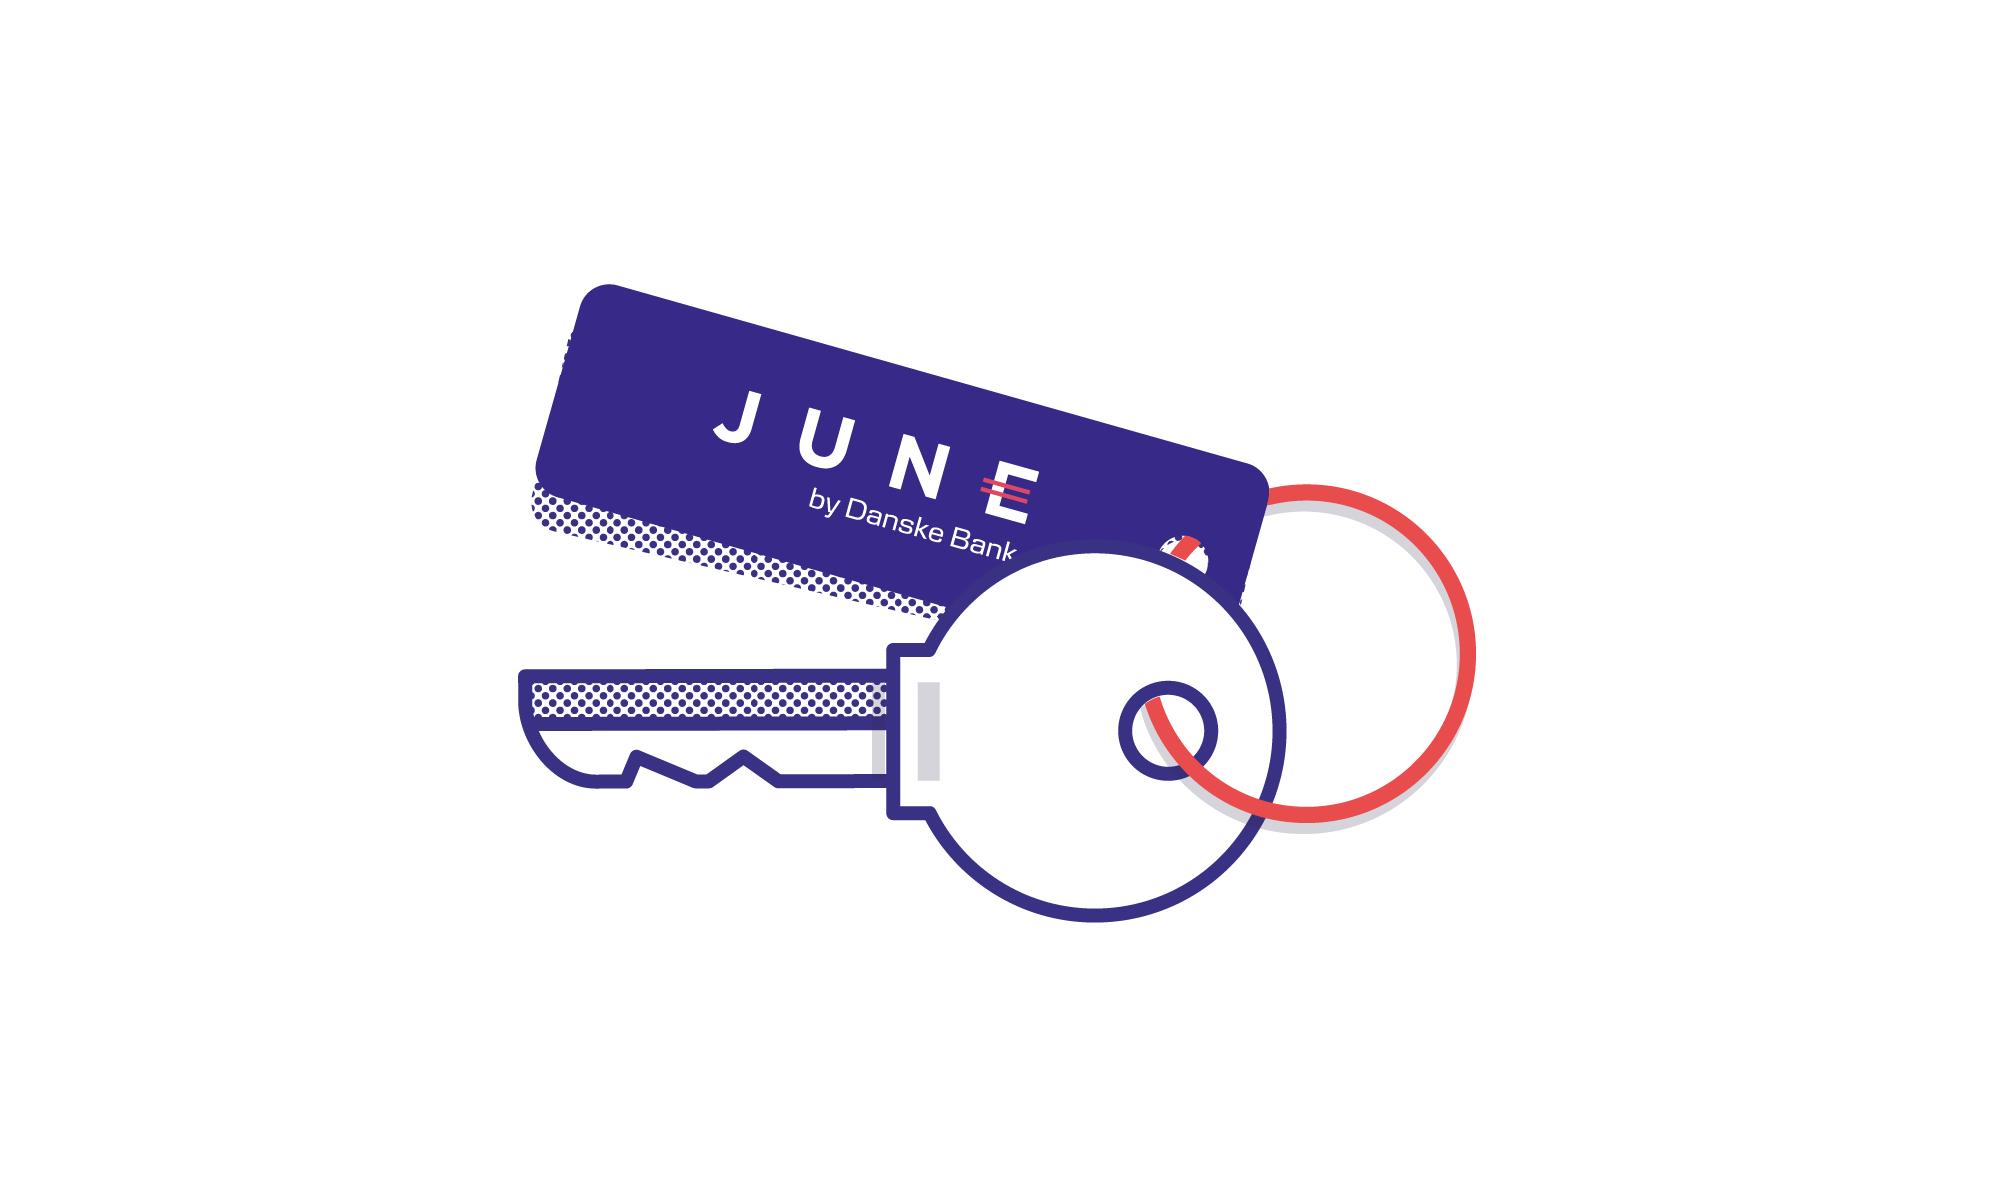 Nyt login på June.dk